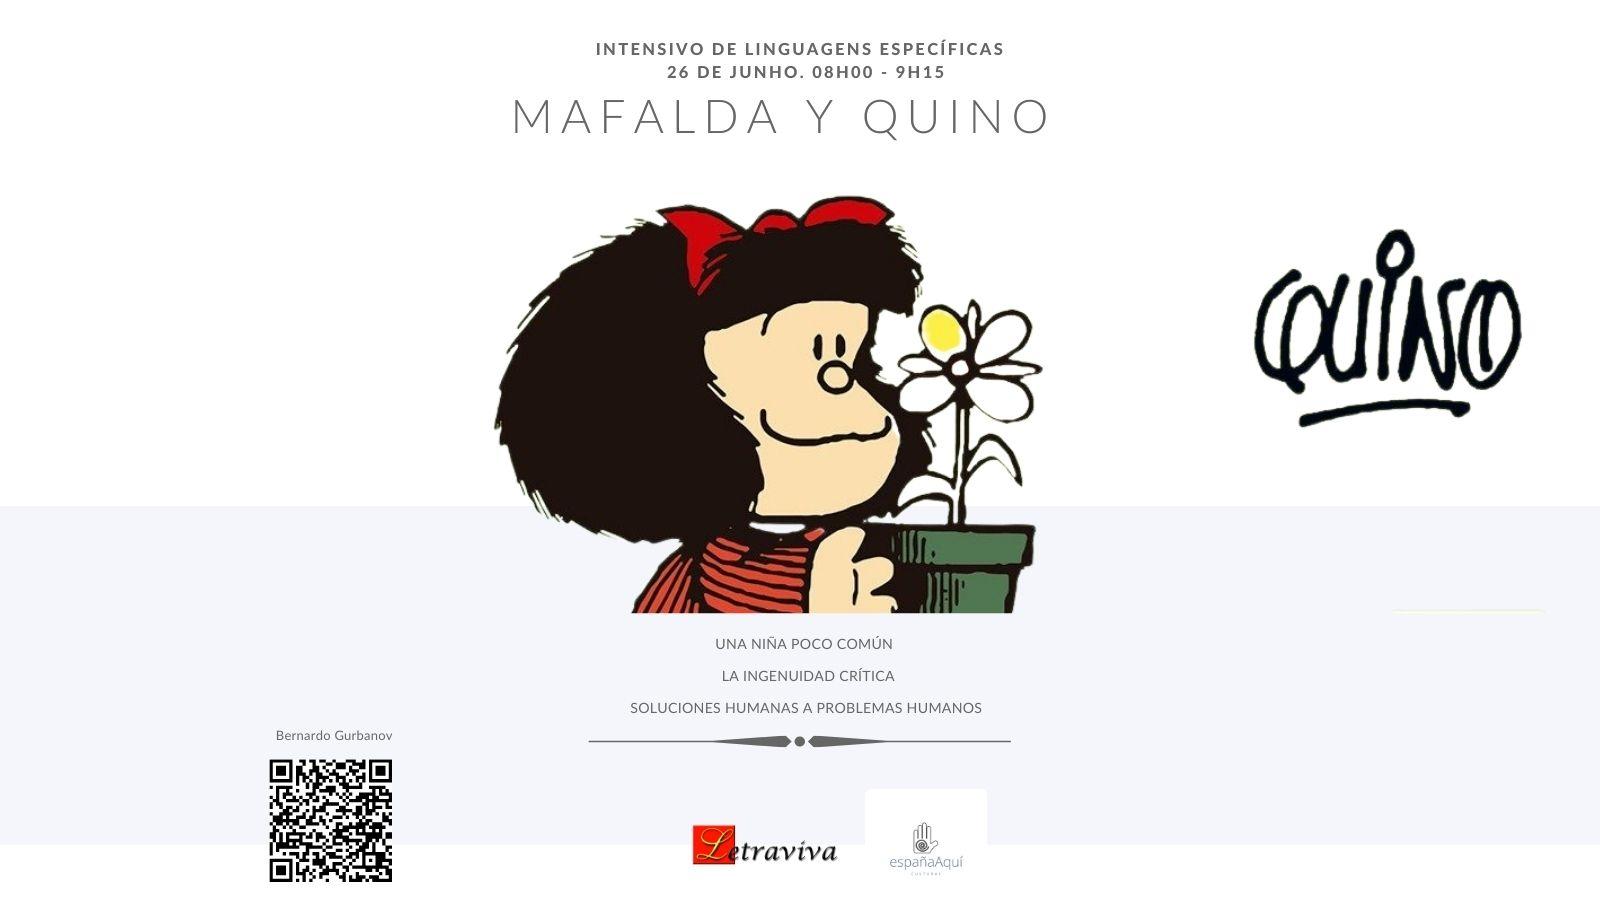 http://www.espanaaqui.com.br/pdf/Junho%202021/Mafalda%20y%20Quino%2026%20de%20Junho.jpg